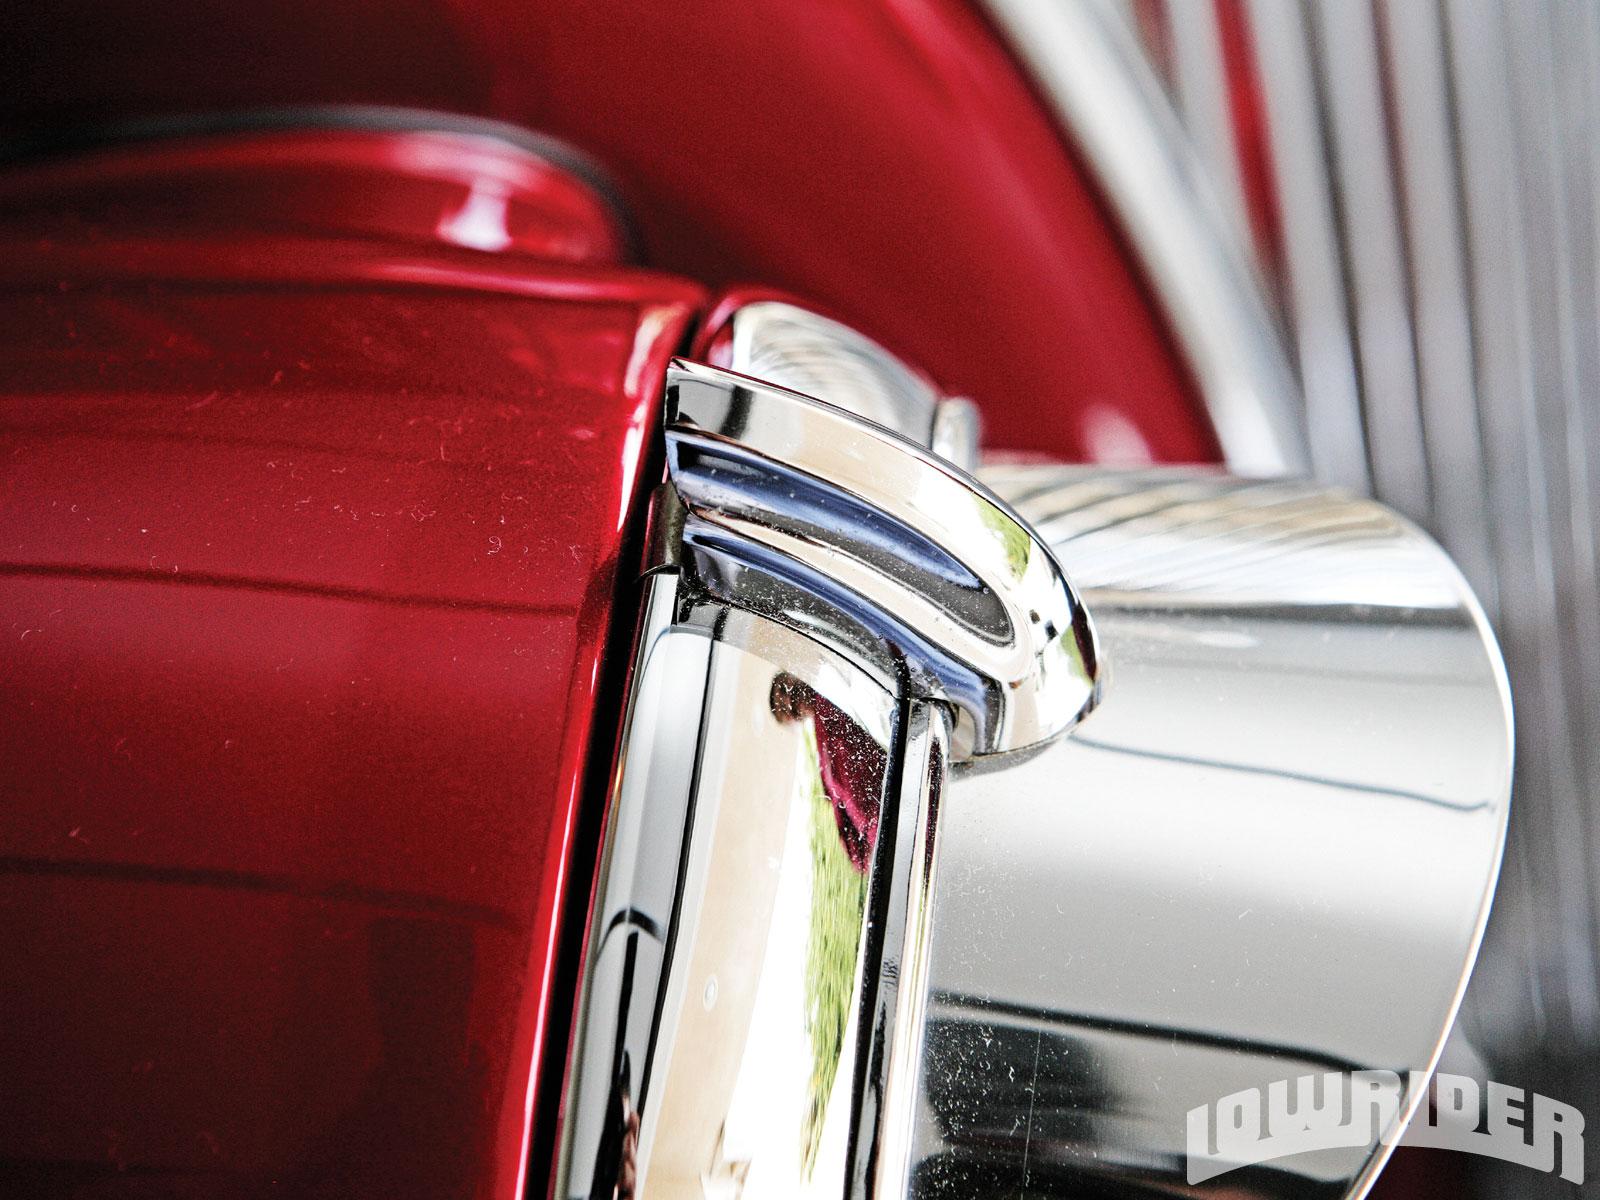 Classic Car Parts & Accessories - Remington Shaver - Lowrider Magazine